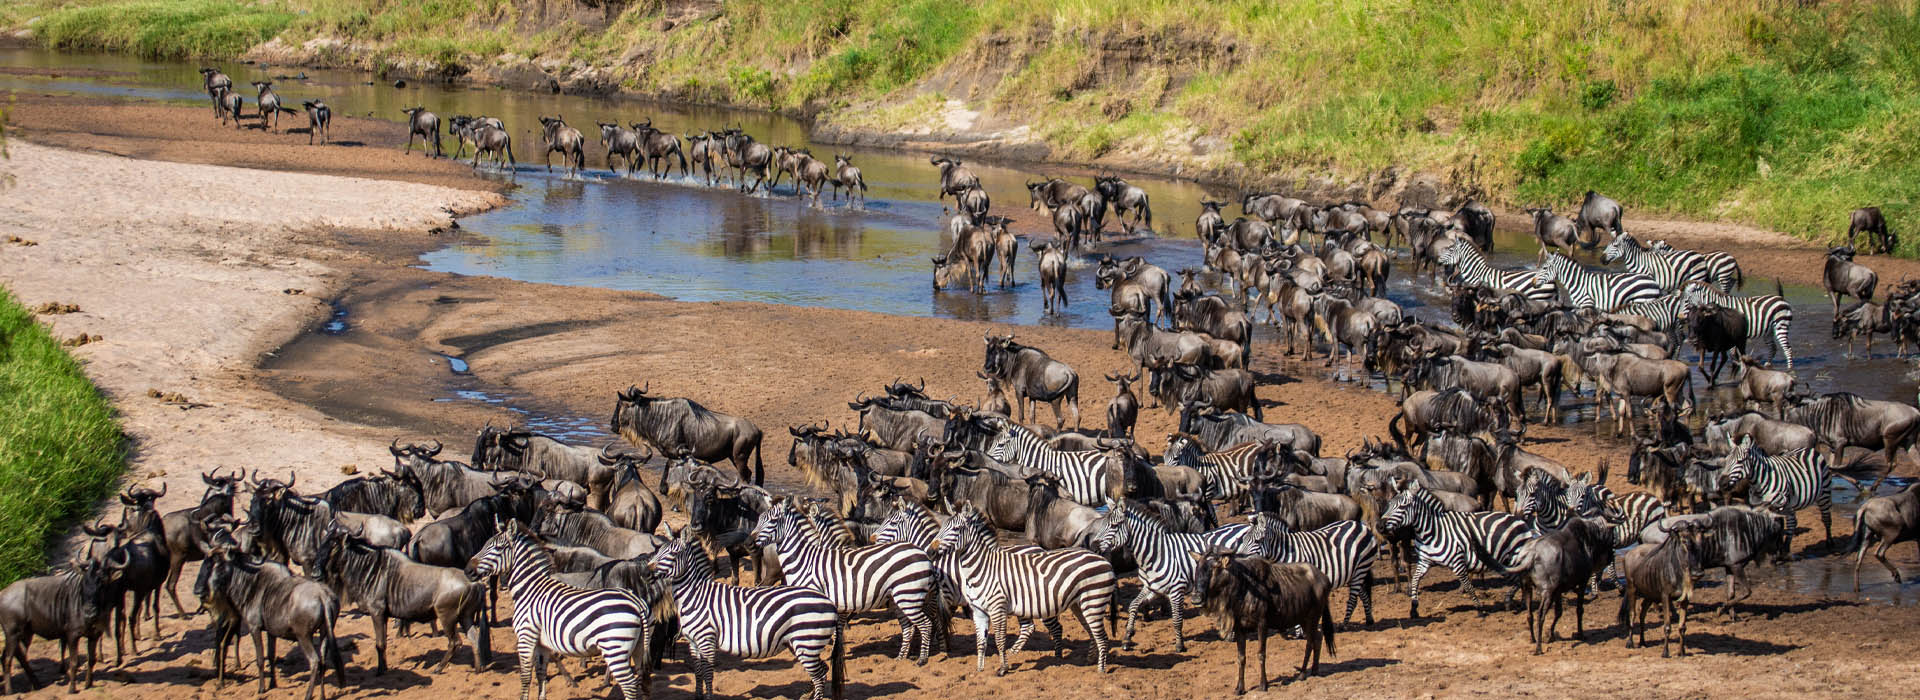 Migration Safari - African Adventure Safaris